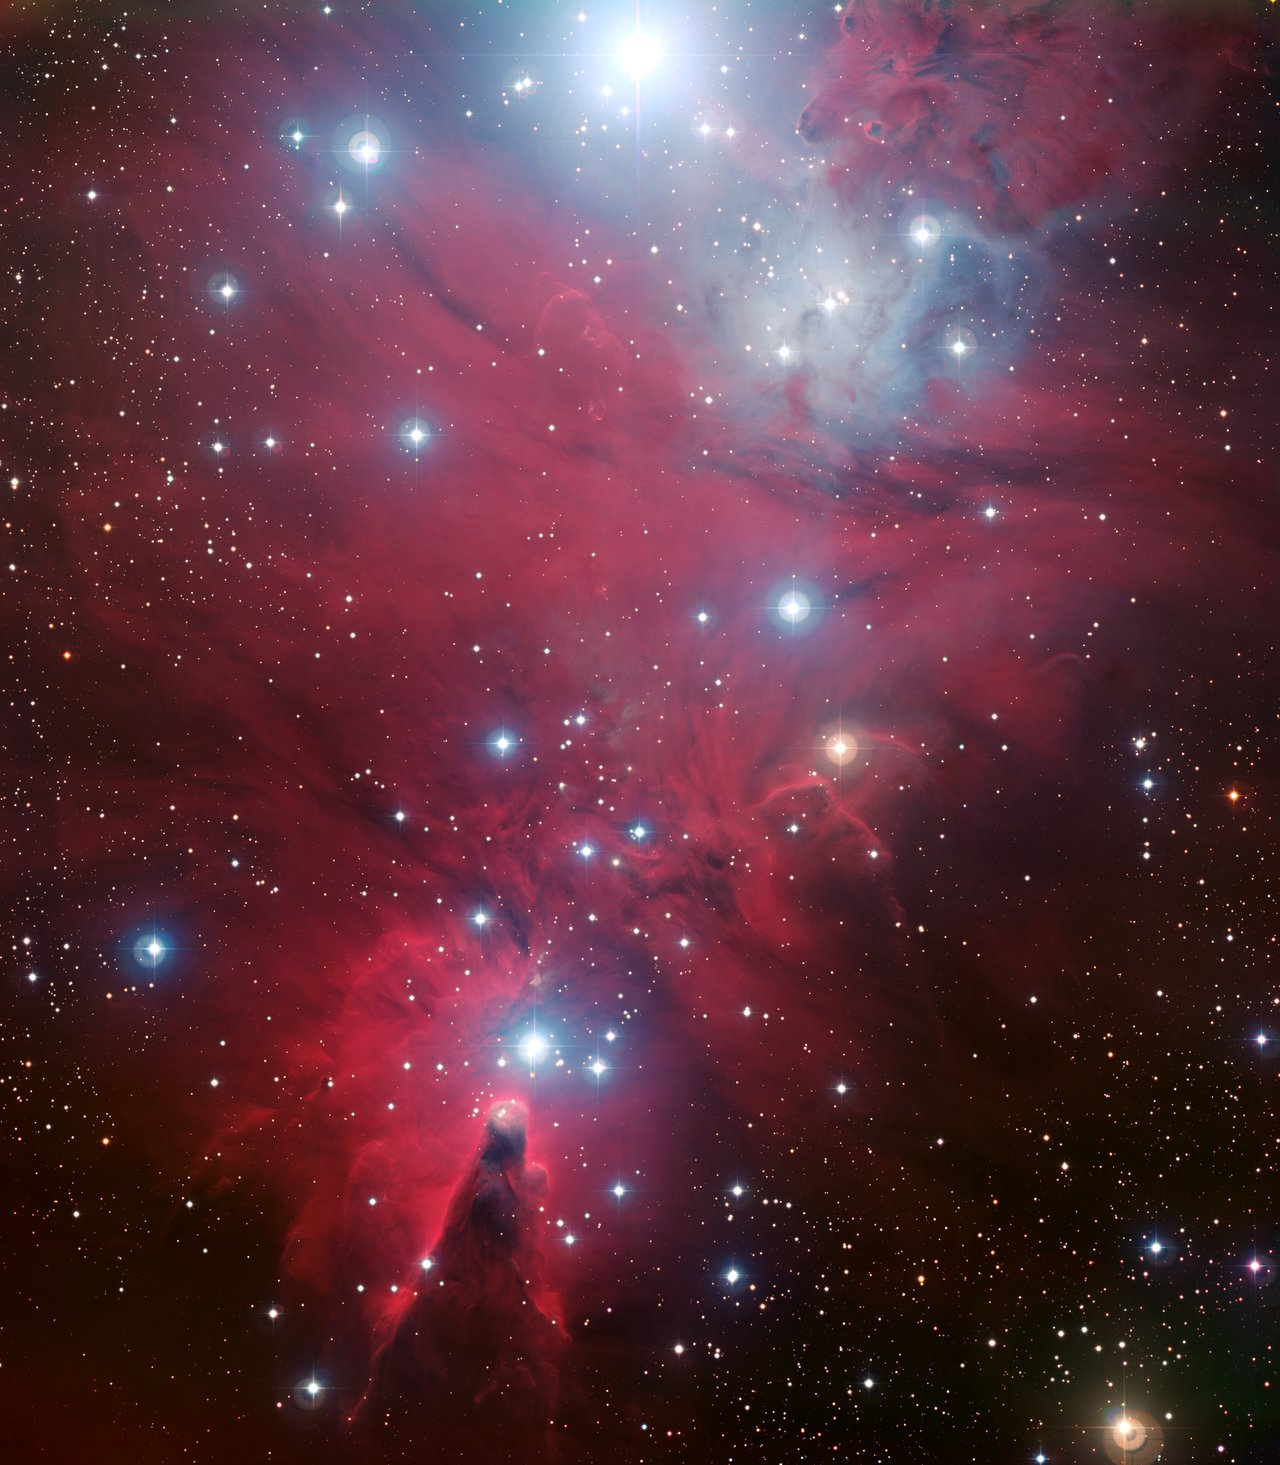 NGC 2264 and the Christmas Tree cluster*.